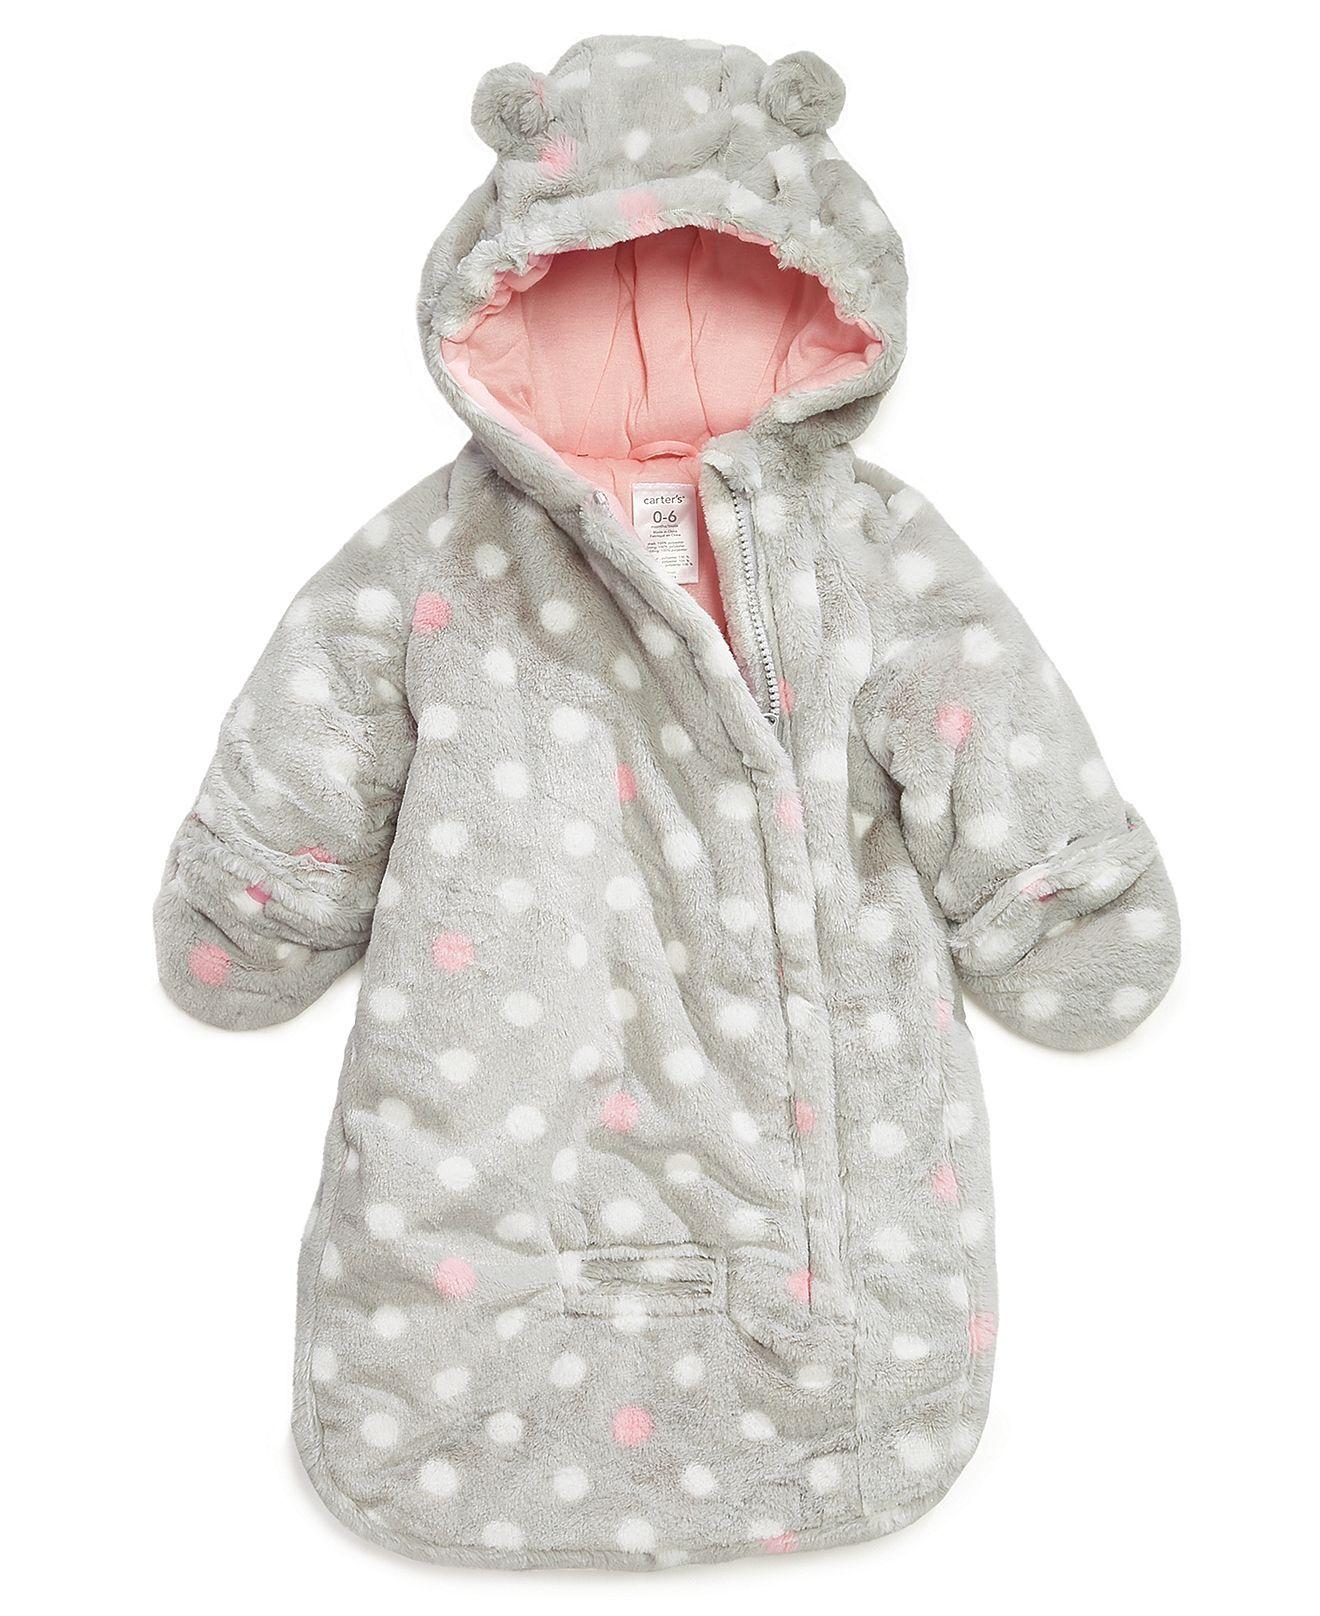 4588fe9bb Carter's Baby Outerwear, Baby Girls Dot-Print Pram Bag - Kids Jackets &  Coats - Macy's